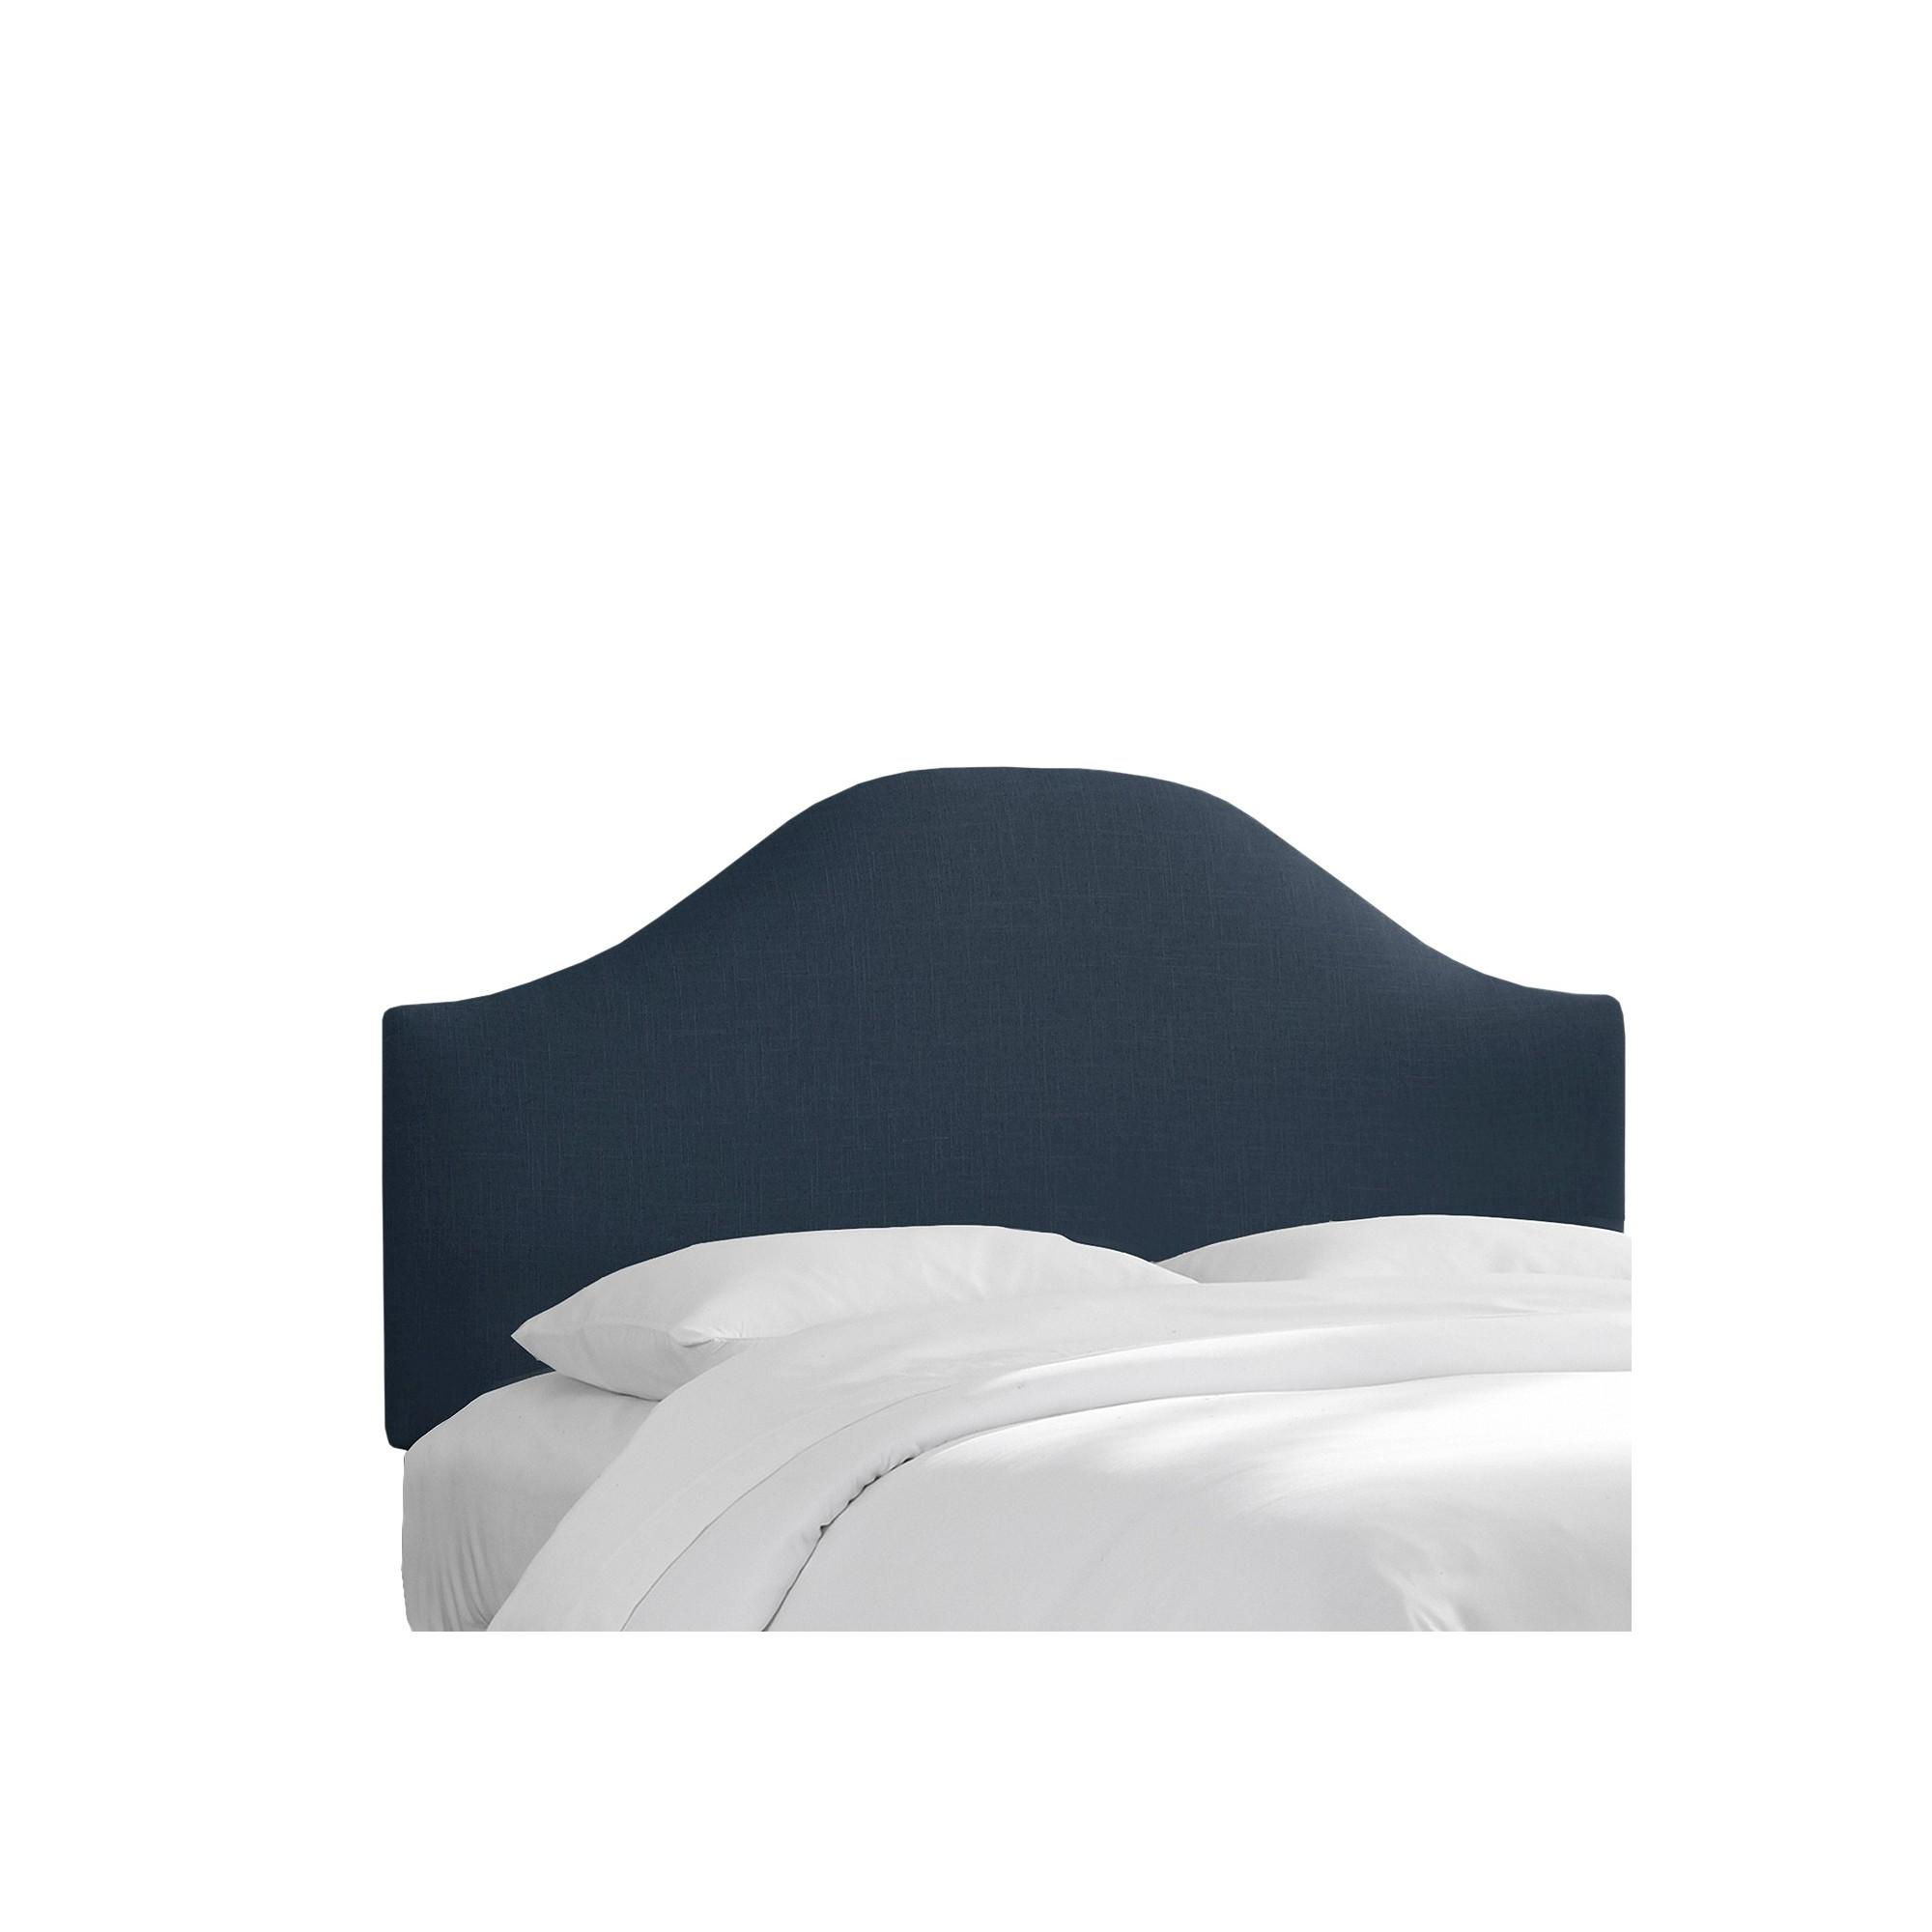 nail cupboard in linen itm skyline ebay bed furniture button